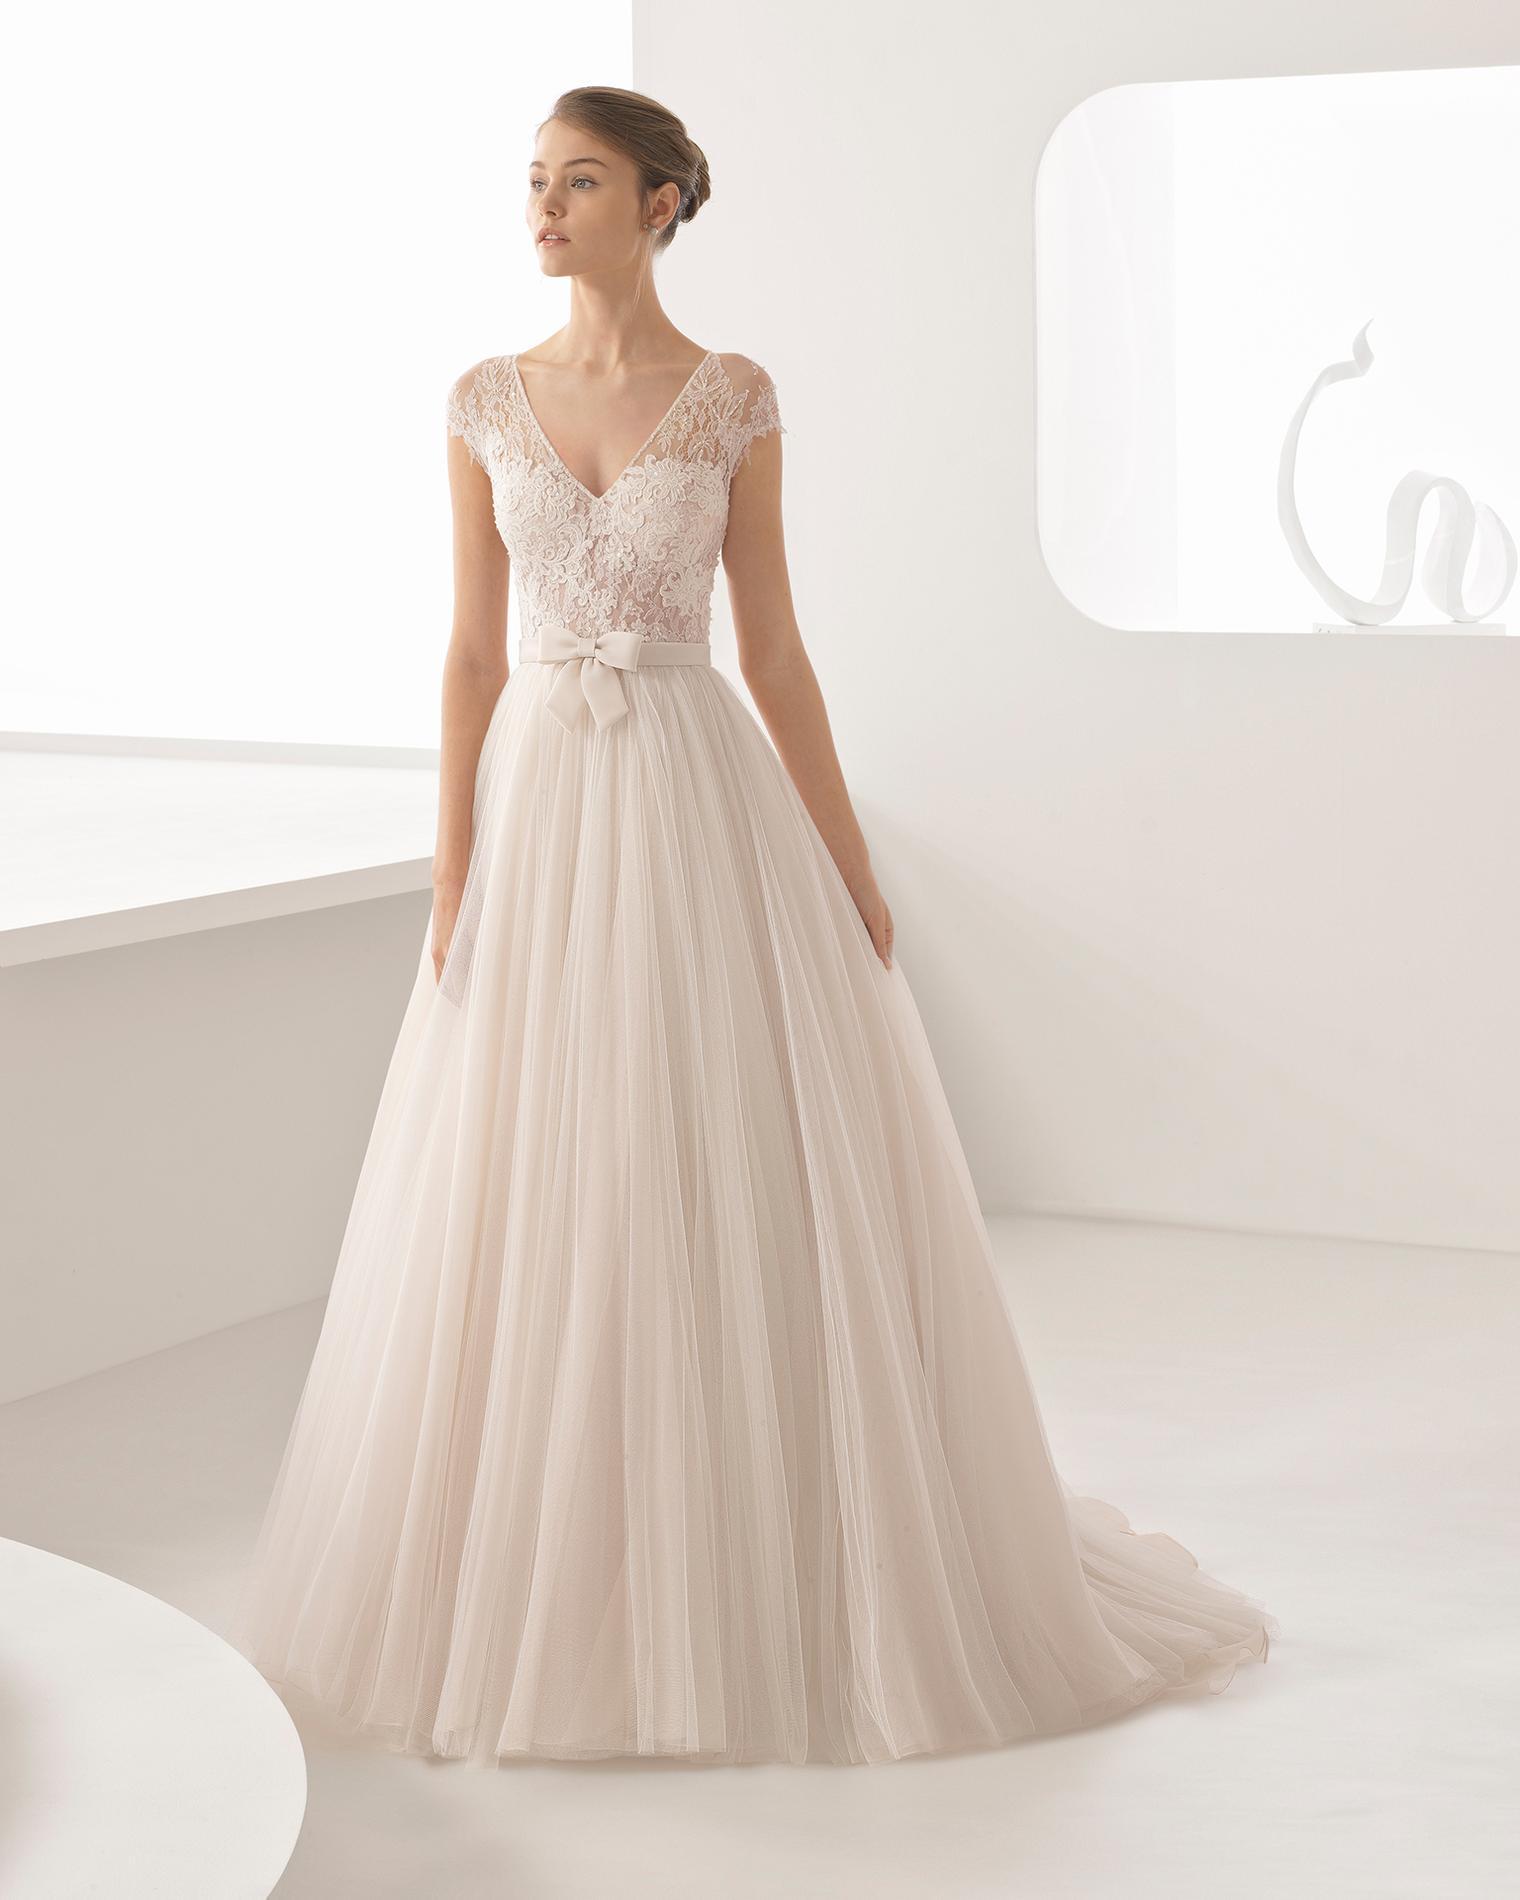 Rosa Clara Quelle robe de mariée choisir lorsque l on a une forte poitrine    - Half Penny London Quelle robe de mariée choisir lorsque l on a une forte  ... 4ecaa0adcee